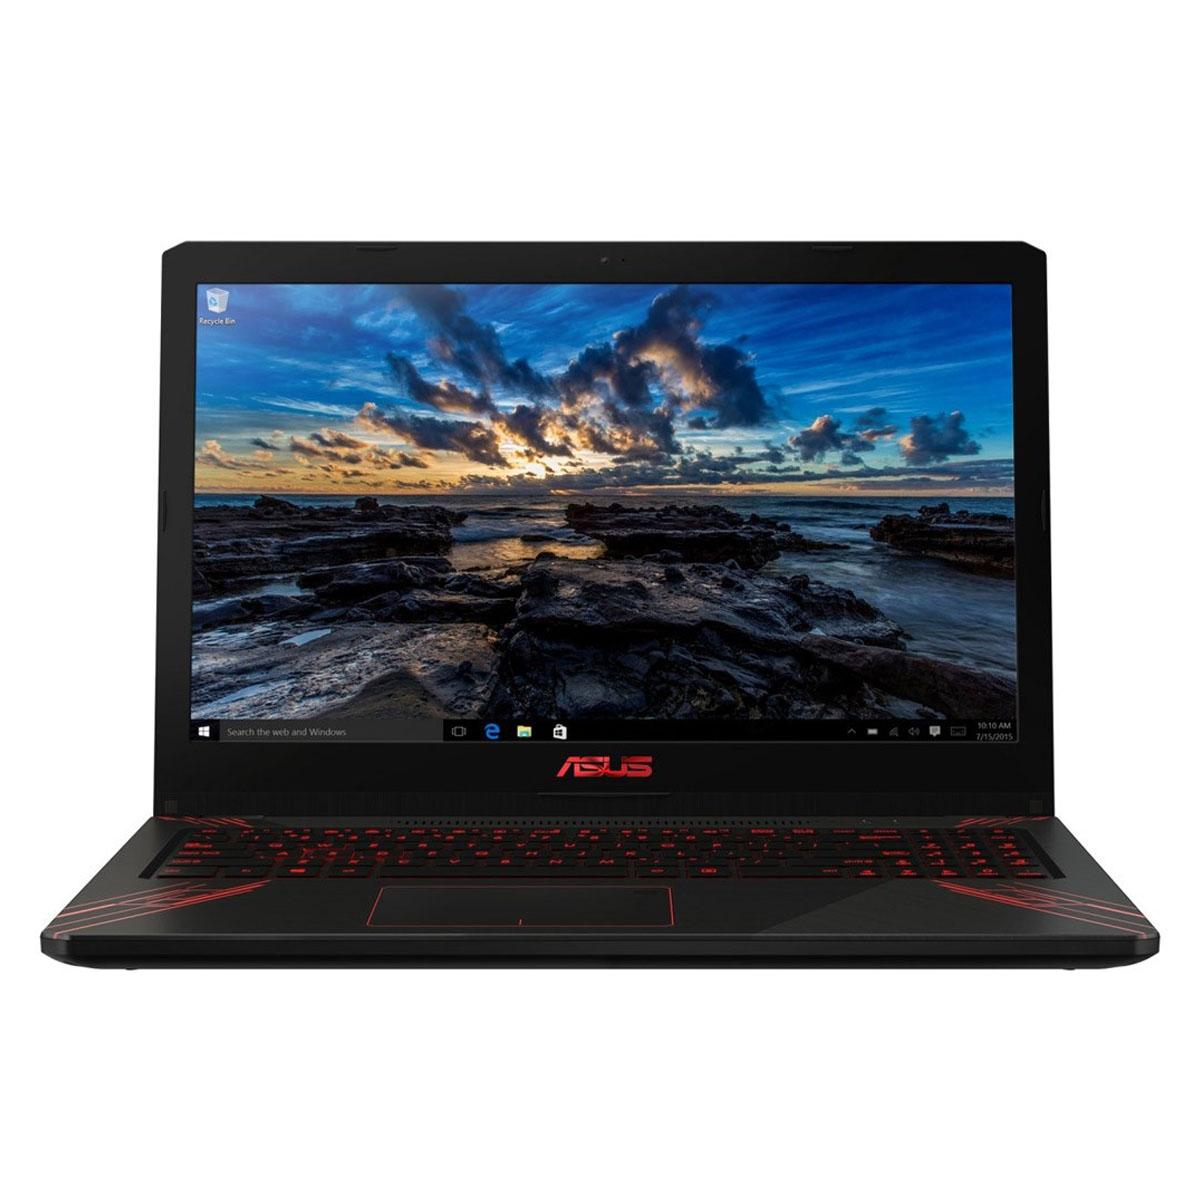 لپ تاپ 15 اینچی ایسوس مدل FX570UD - NP